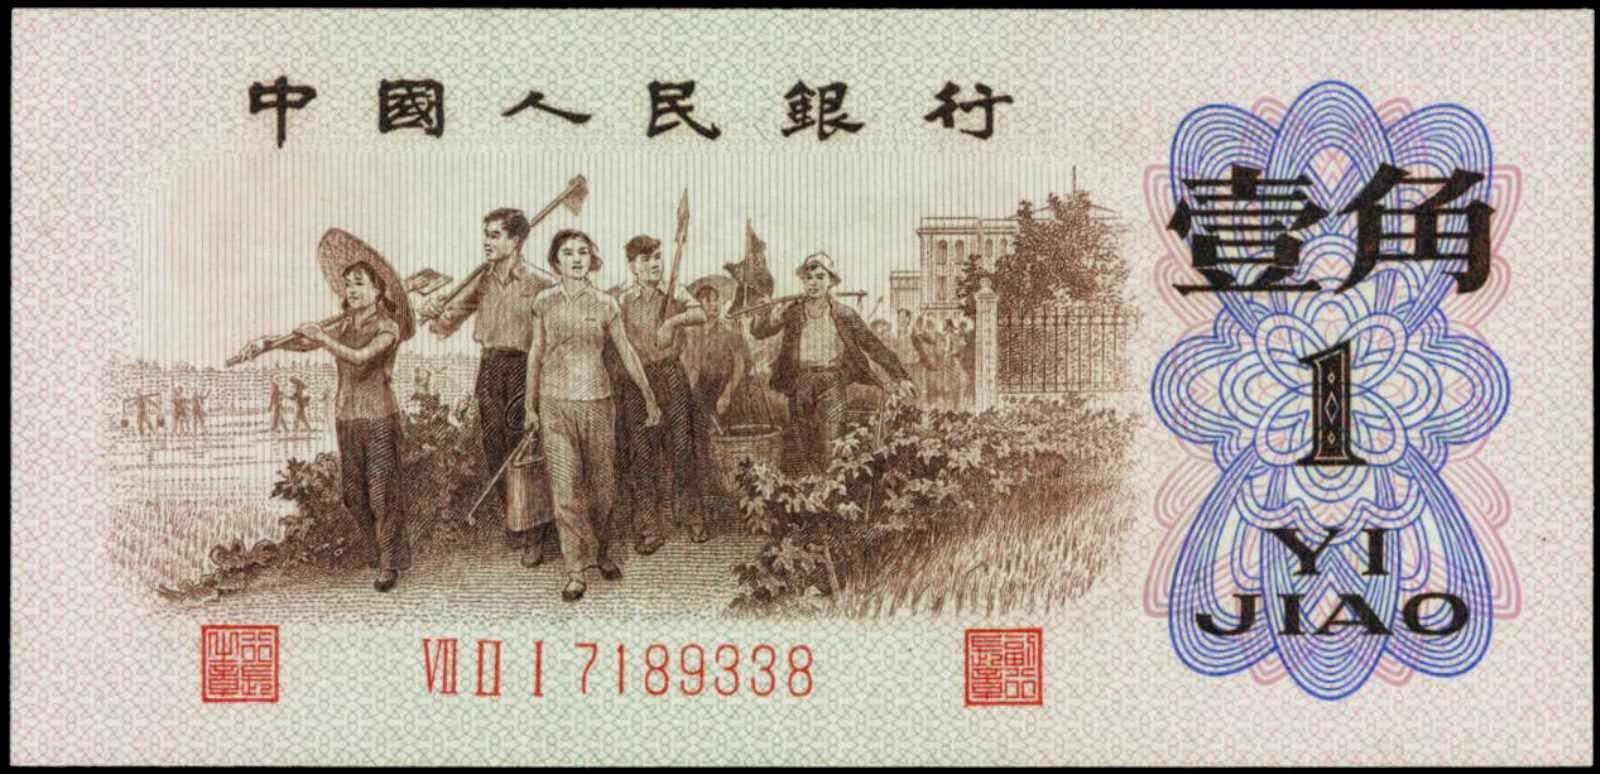 China%2B1%2BJiao%2Bbanknote%2B1962.JPG